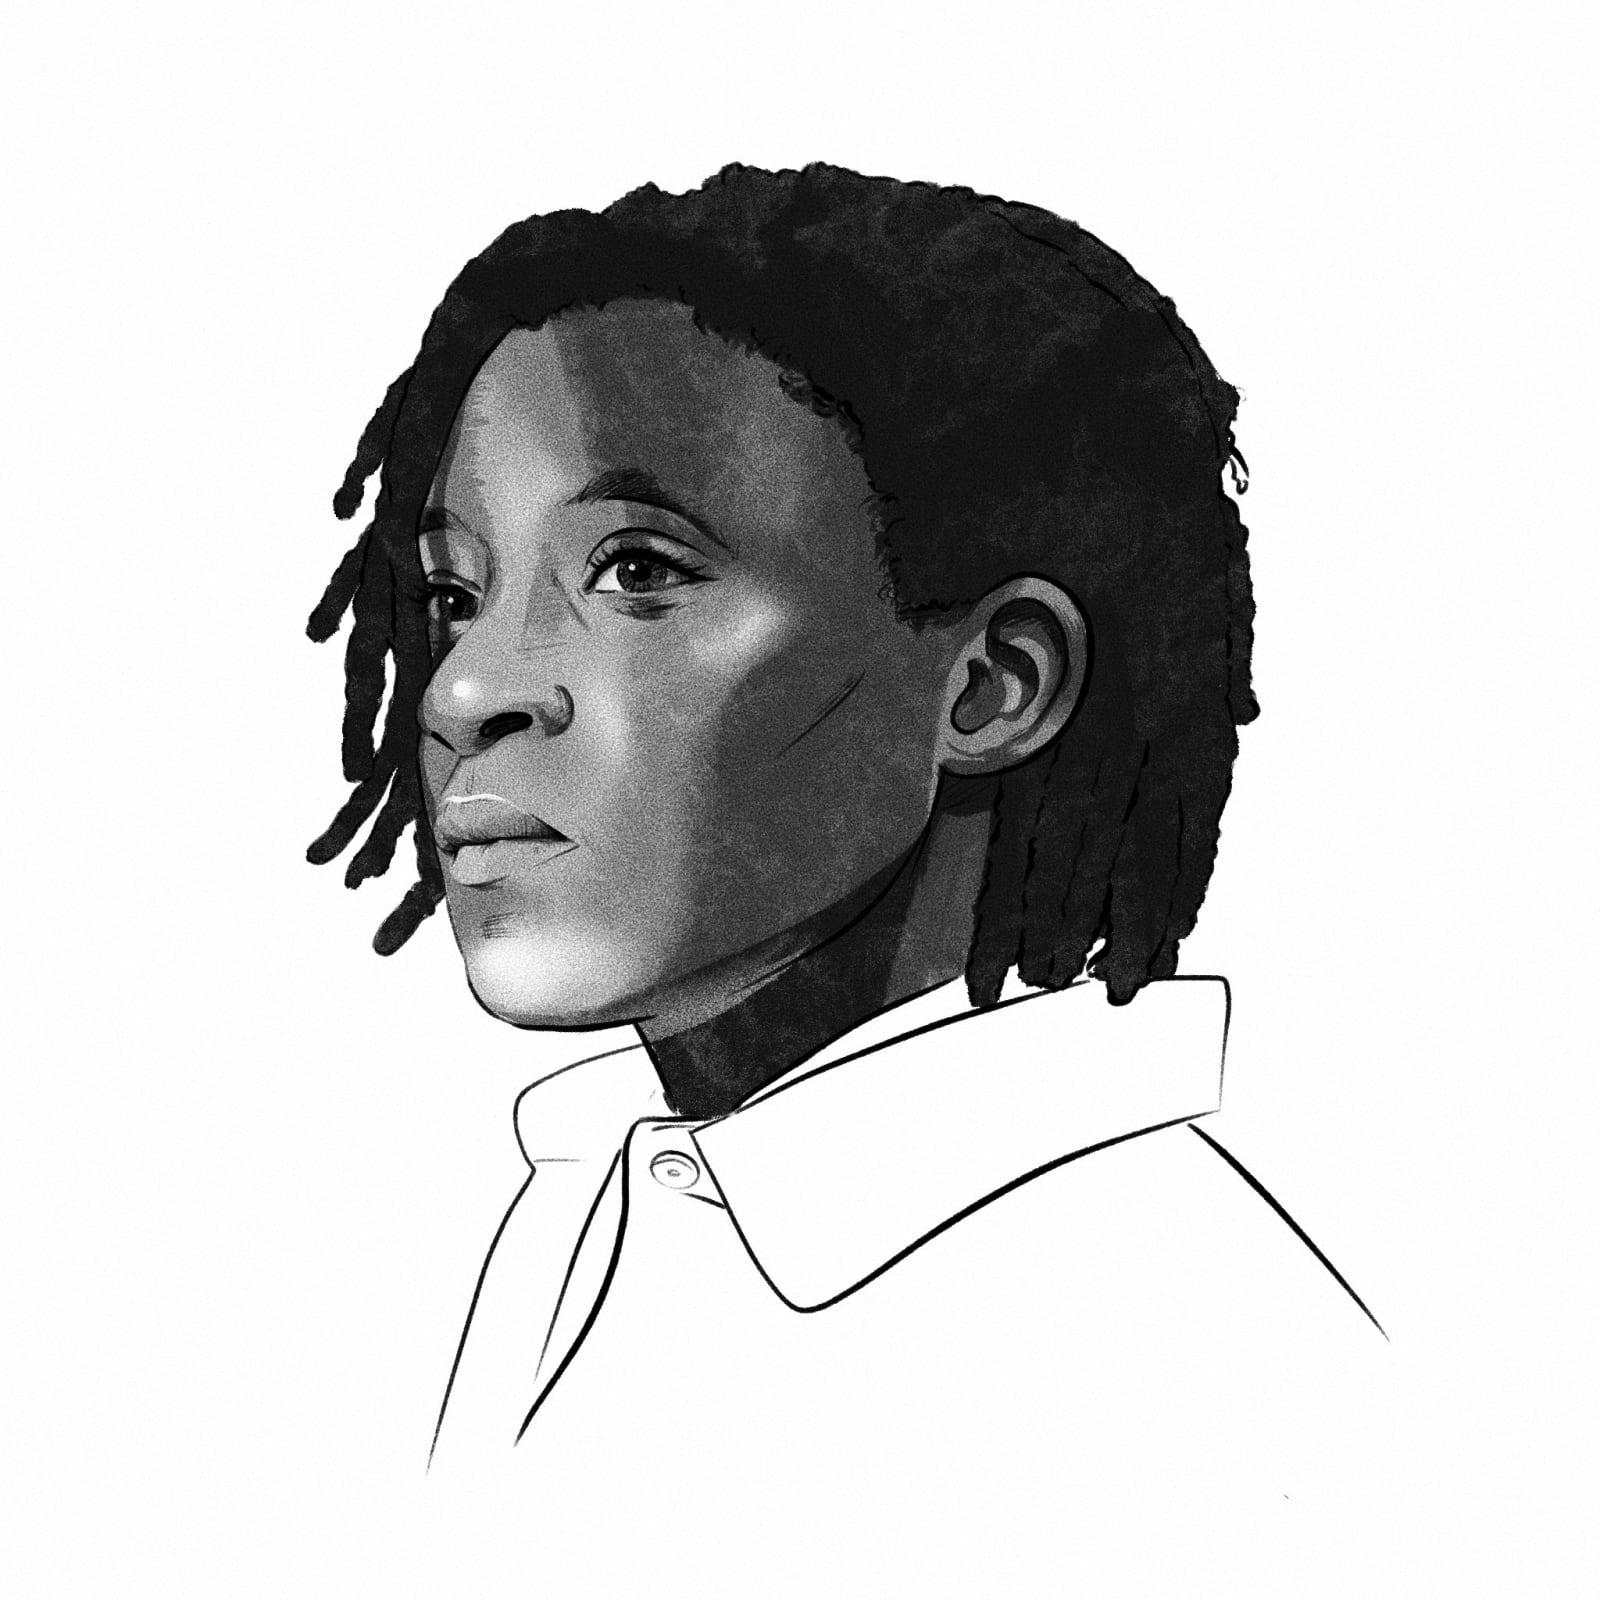 KUDZANAI VOILET HWAMI ARTIST READ MORE